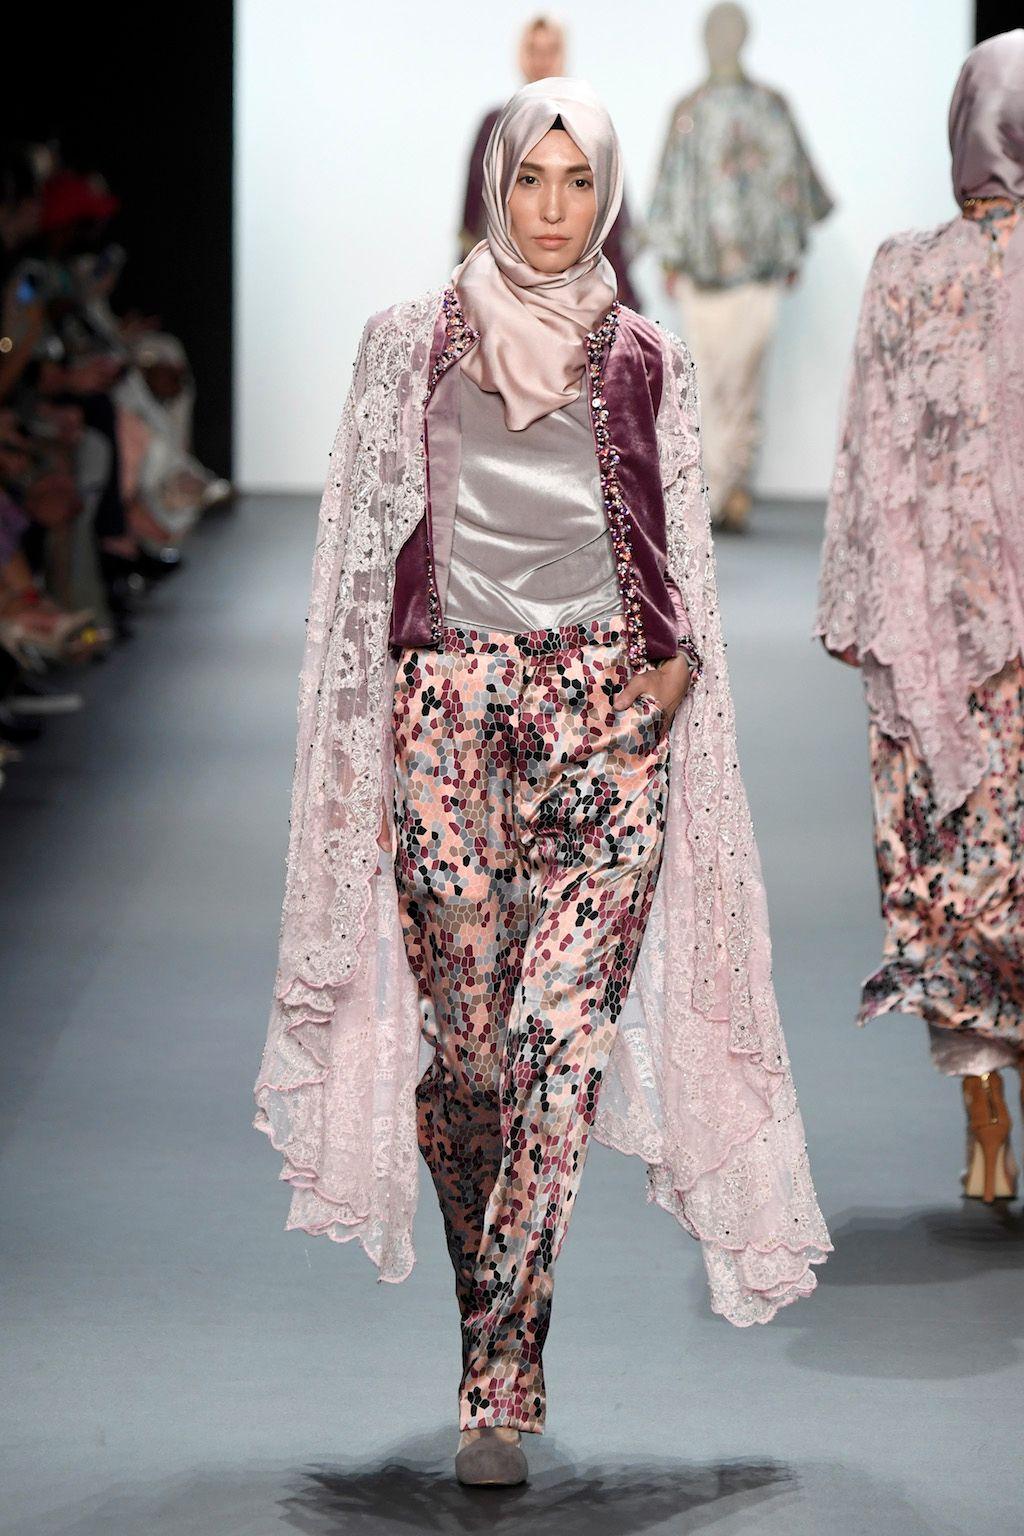 Muslim fashion designer new york 76